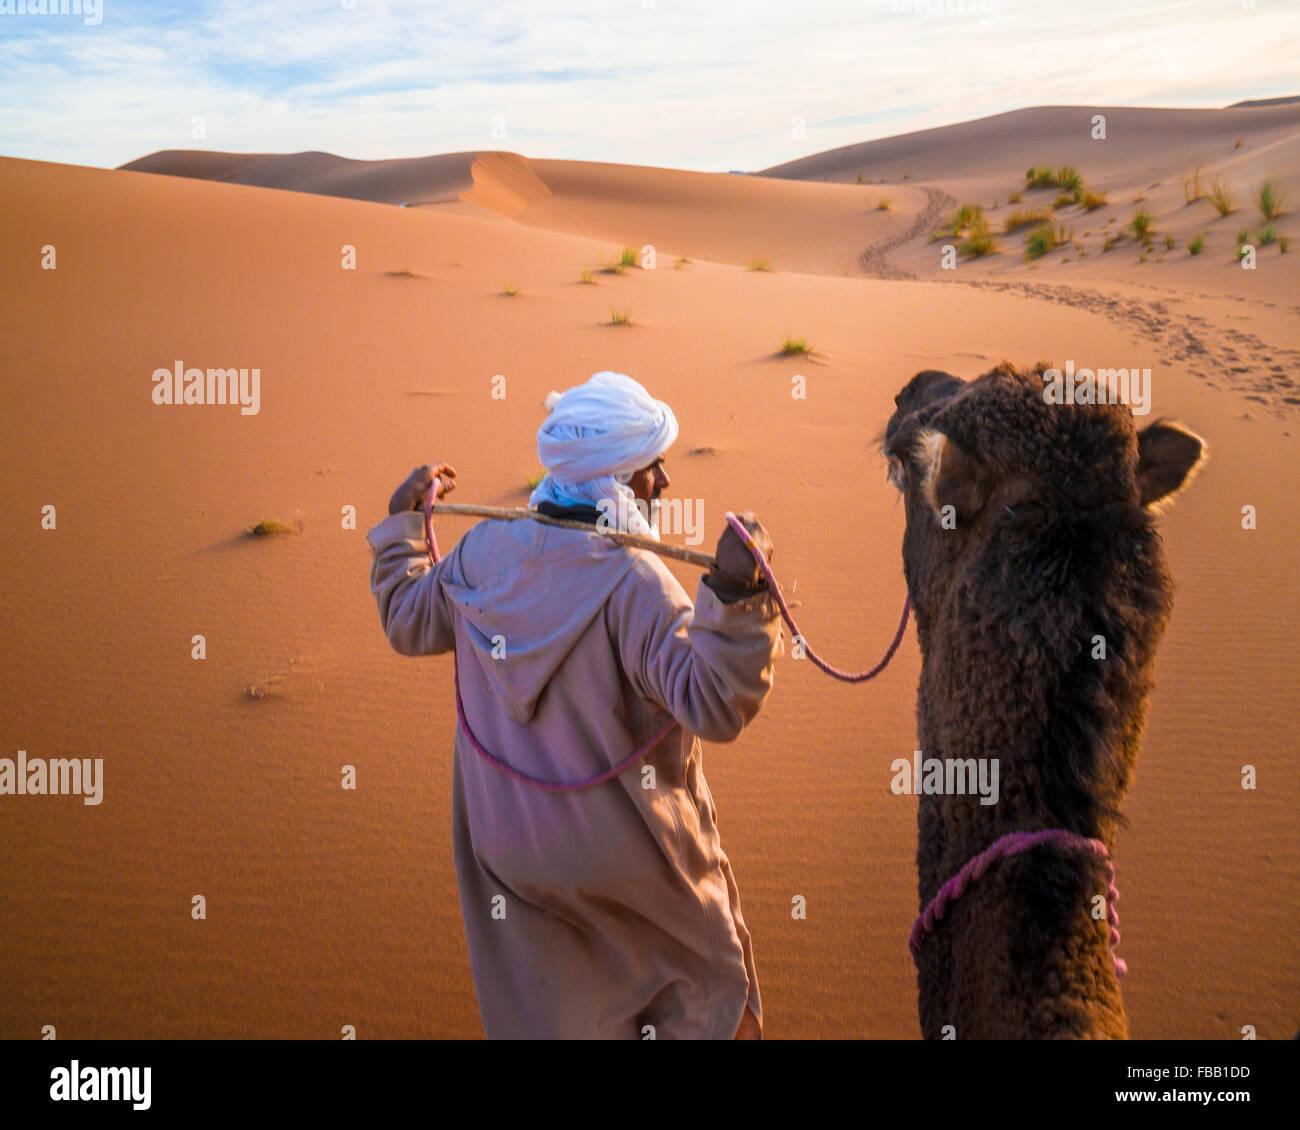 Man leading camel, Erg Chegaga Morocco - Stock Image